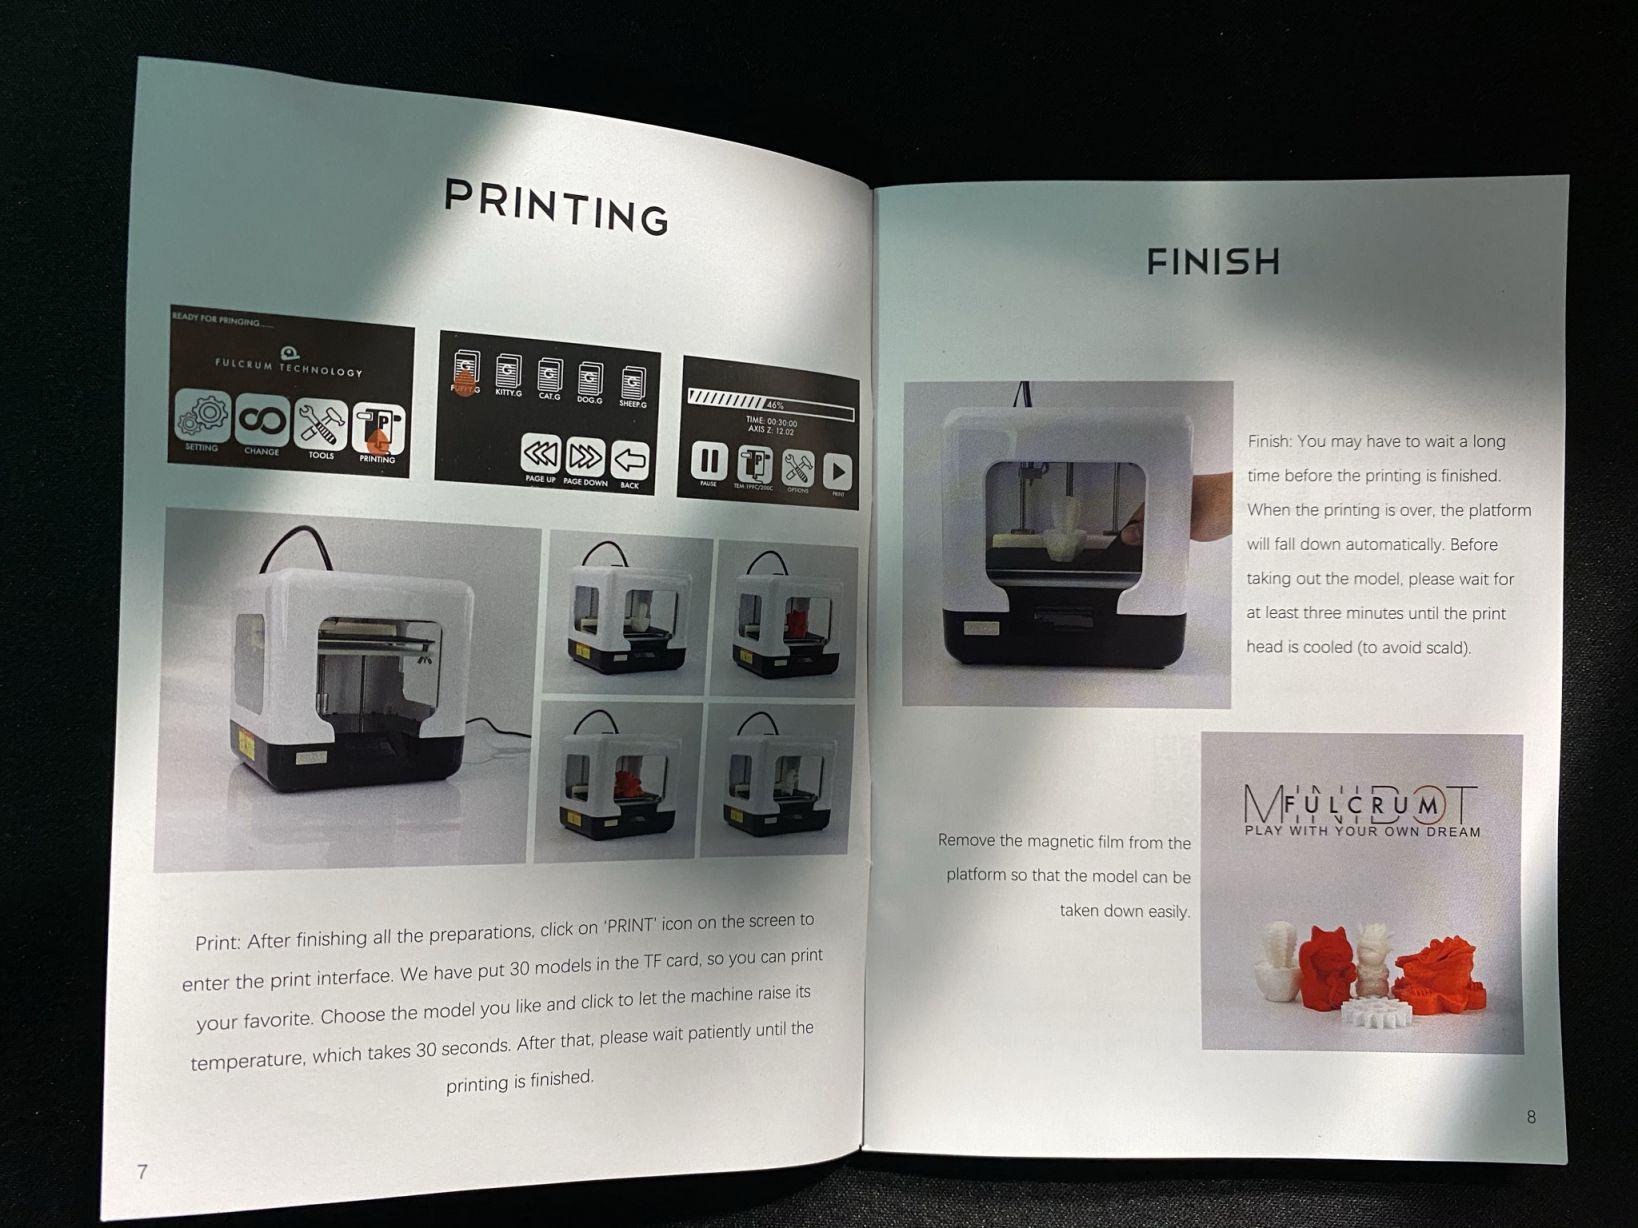 recensione-stampante-3d-flucrum-minibot-8 Recensione FULCRUM MINIBOT, Stampante 3D Facile e Veloce